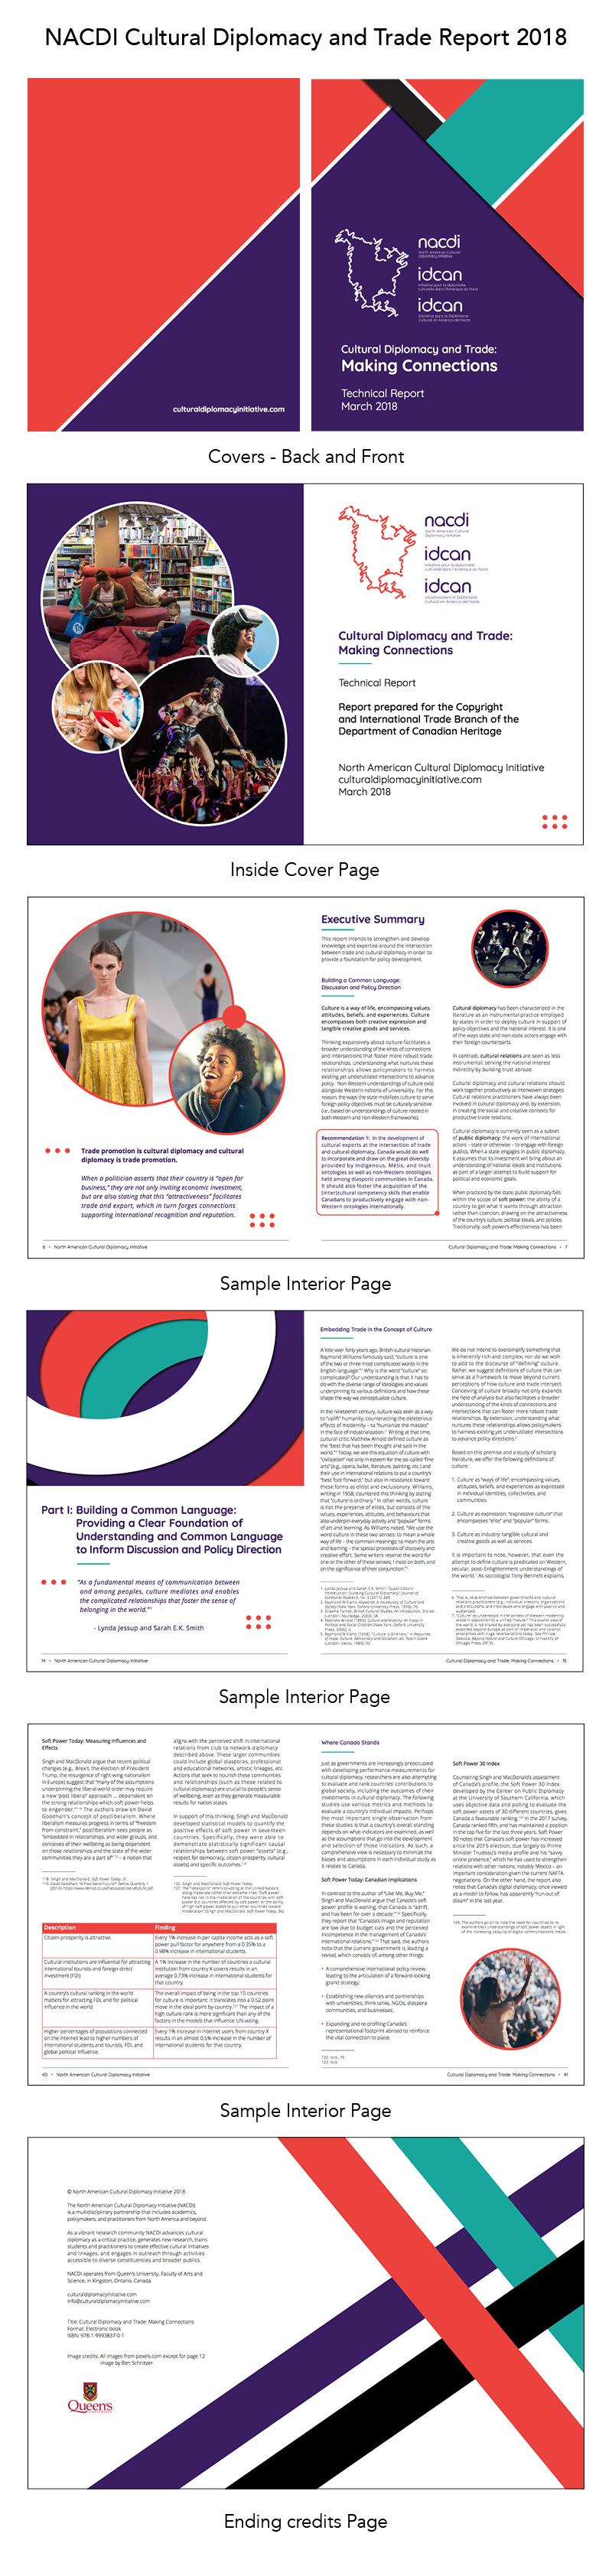 NACDI – Identity and Print Design | Sam Mogelonsky